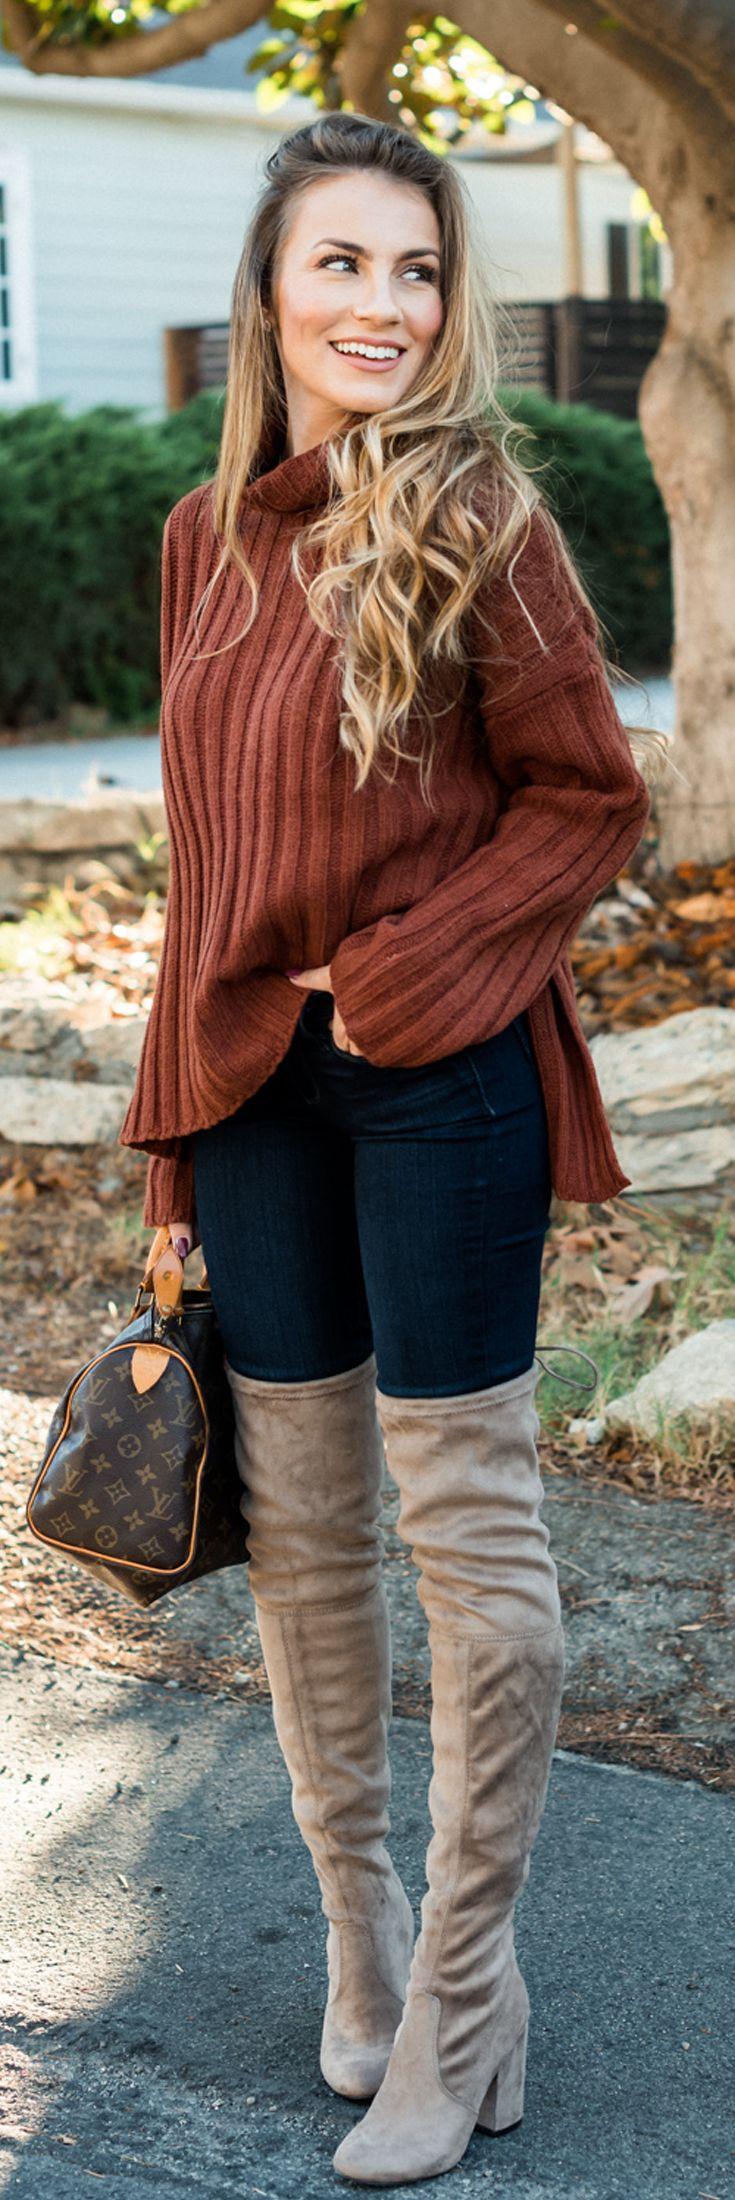 black-skinny-jeans-tan-shoe-boots-otk-camel-sweater-turtleneck-blonde-brown-bag-fall-winter-lunch.jpg